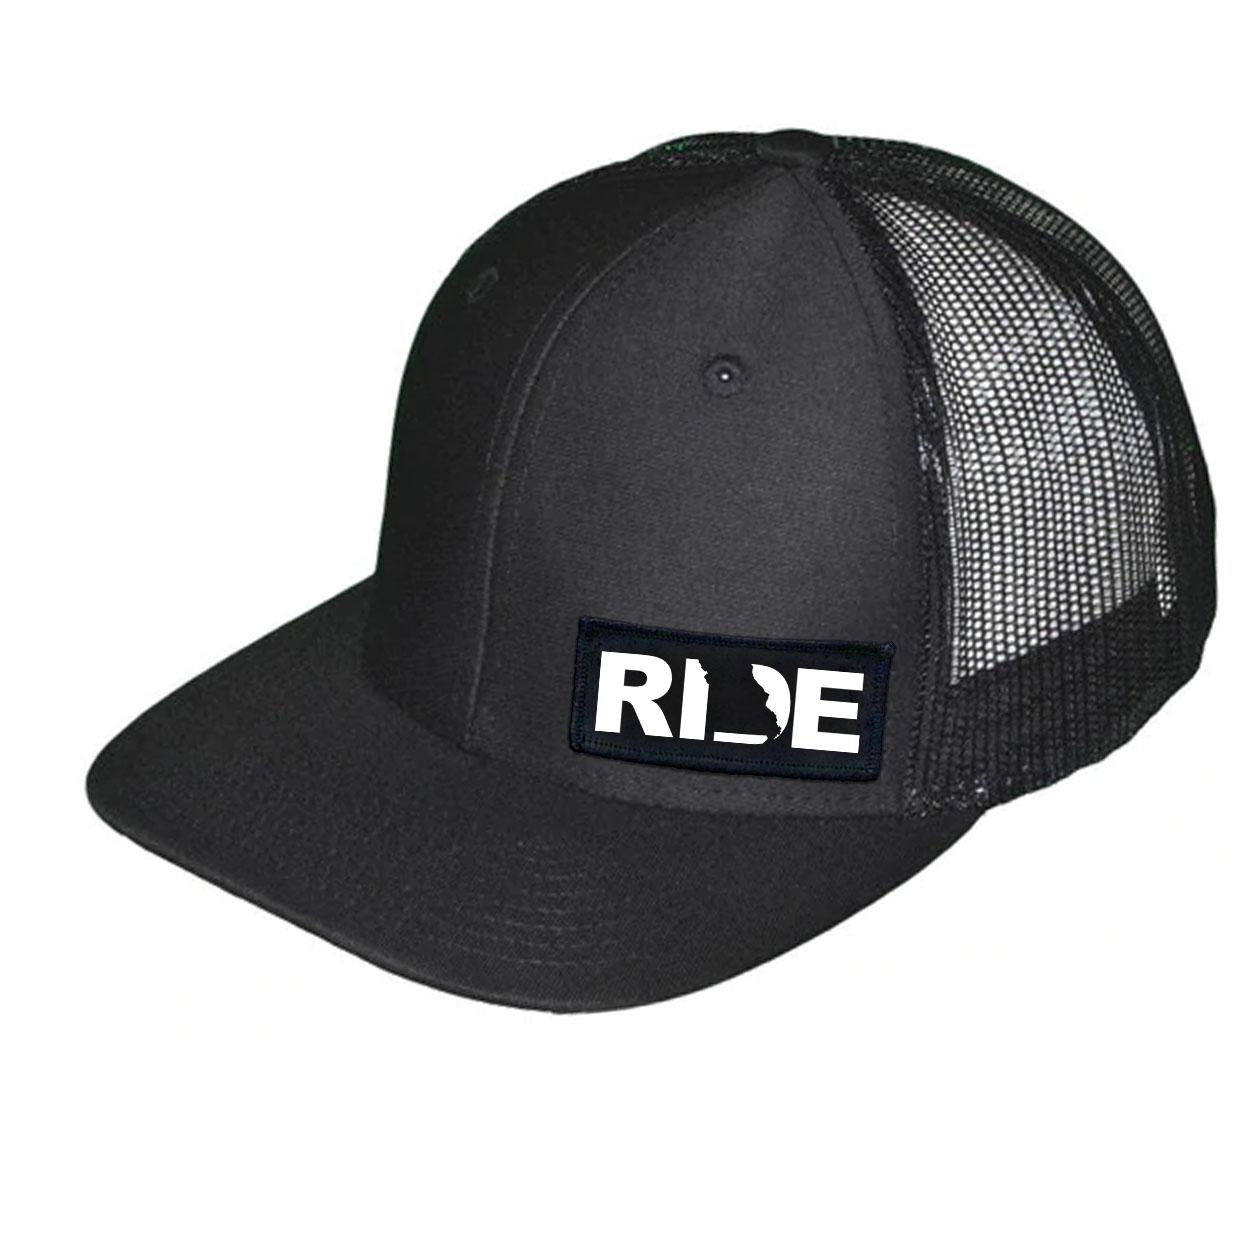 Ride Missouri Night Out Woven Patch Snapback Trucker Hat Black (White Logo)